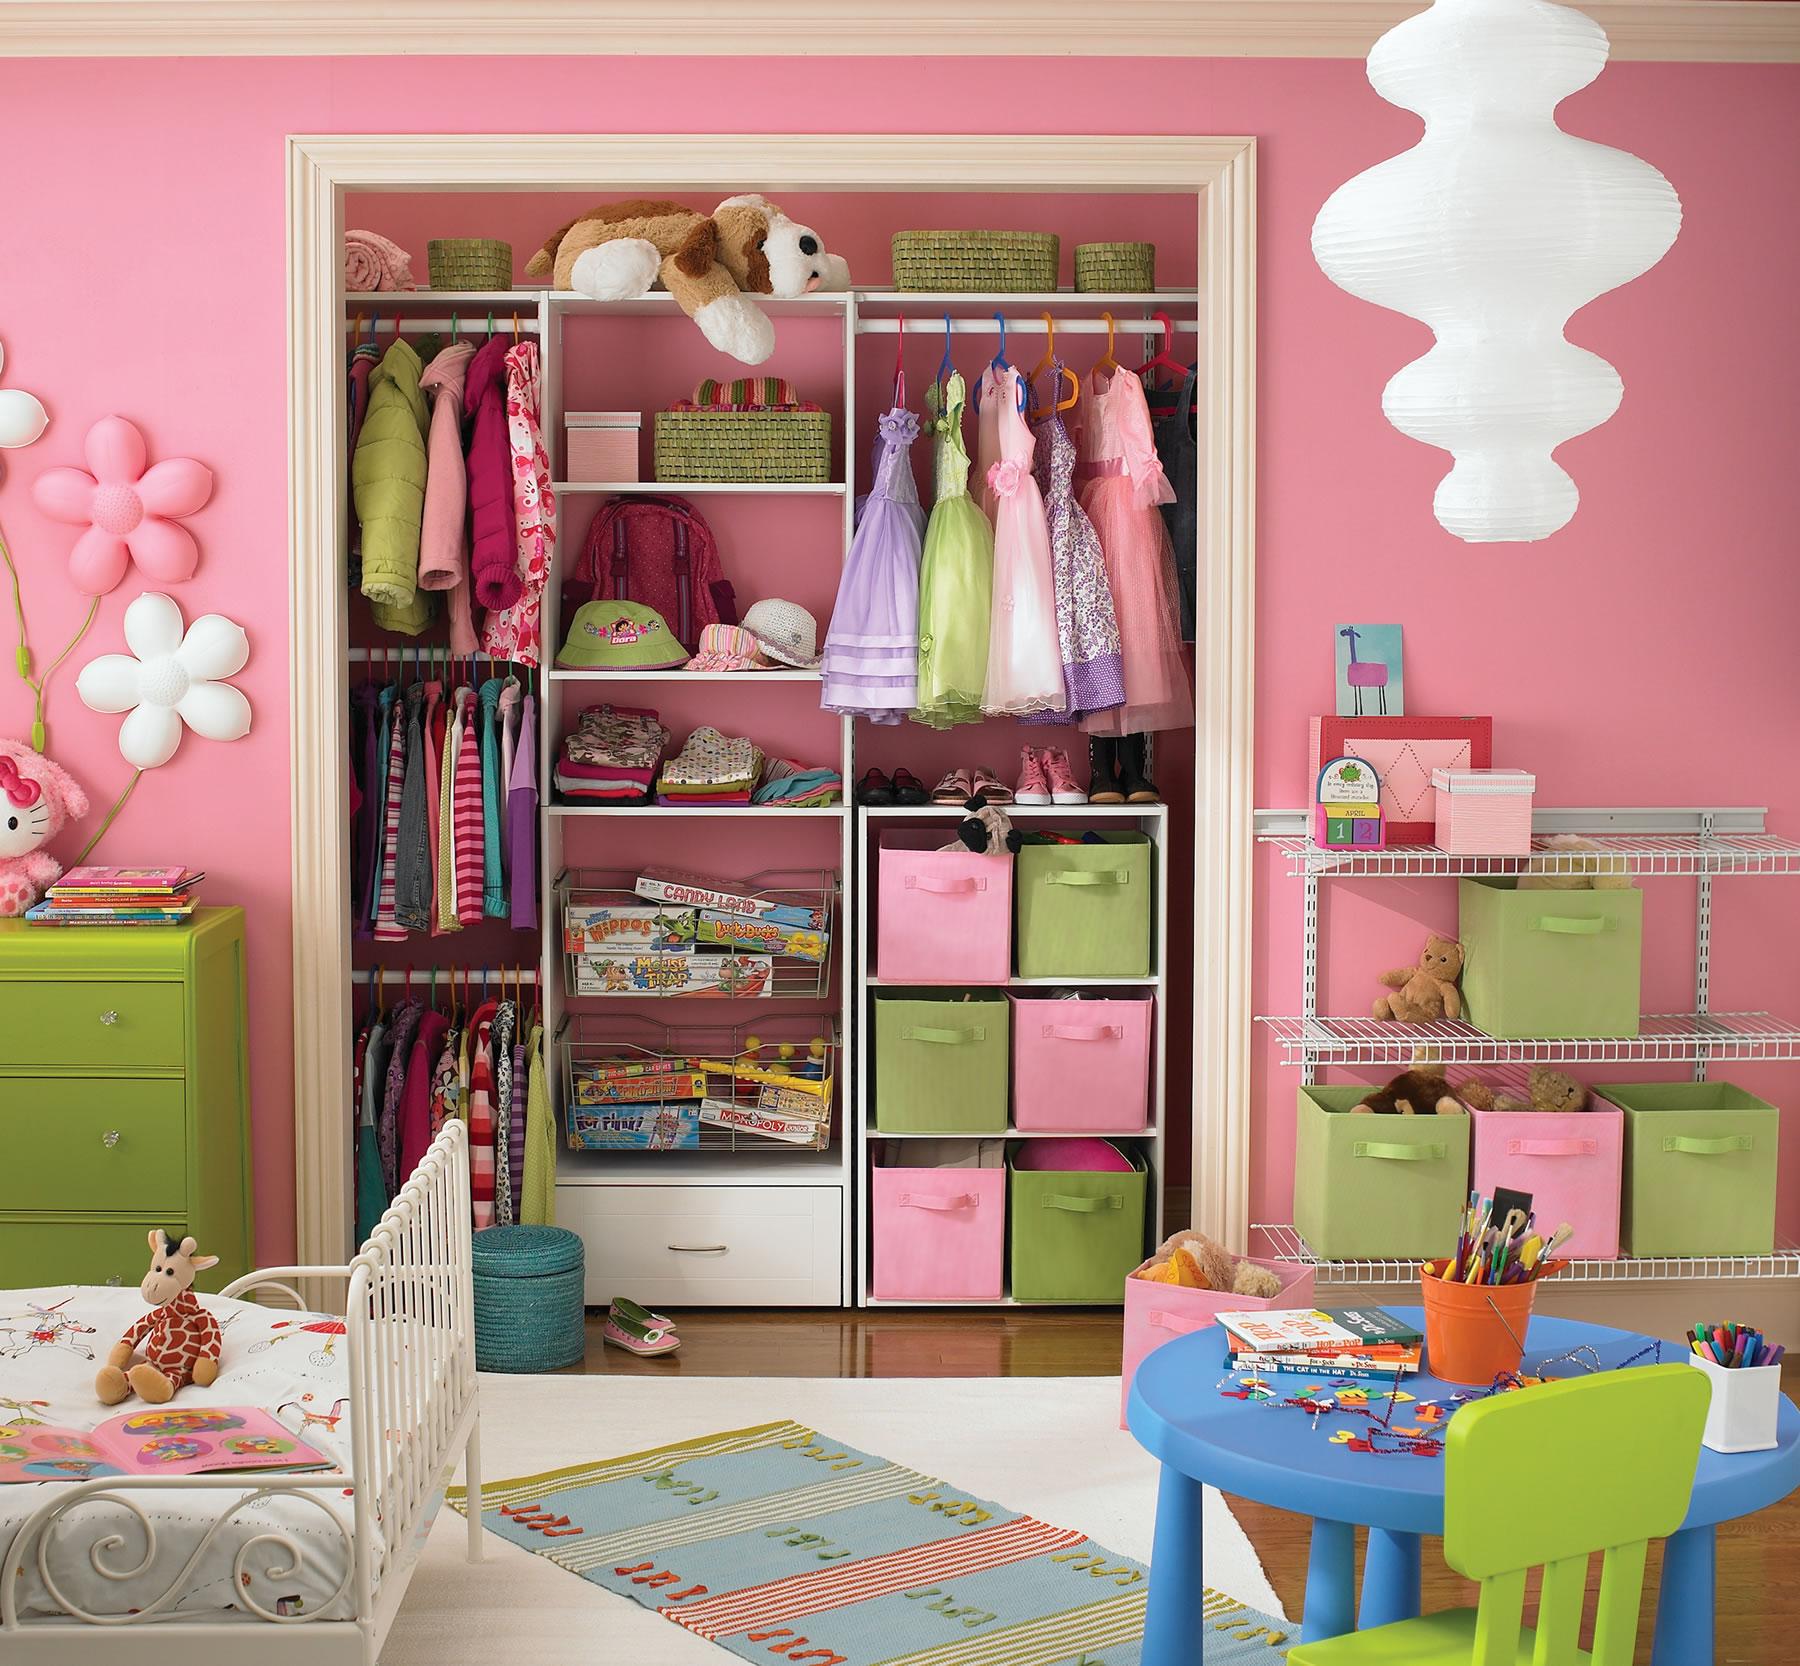 Closet Ideas For Small Spaces: Closet Organizers For Small Closets